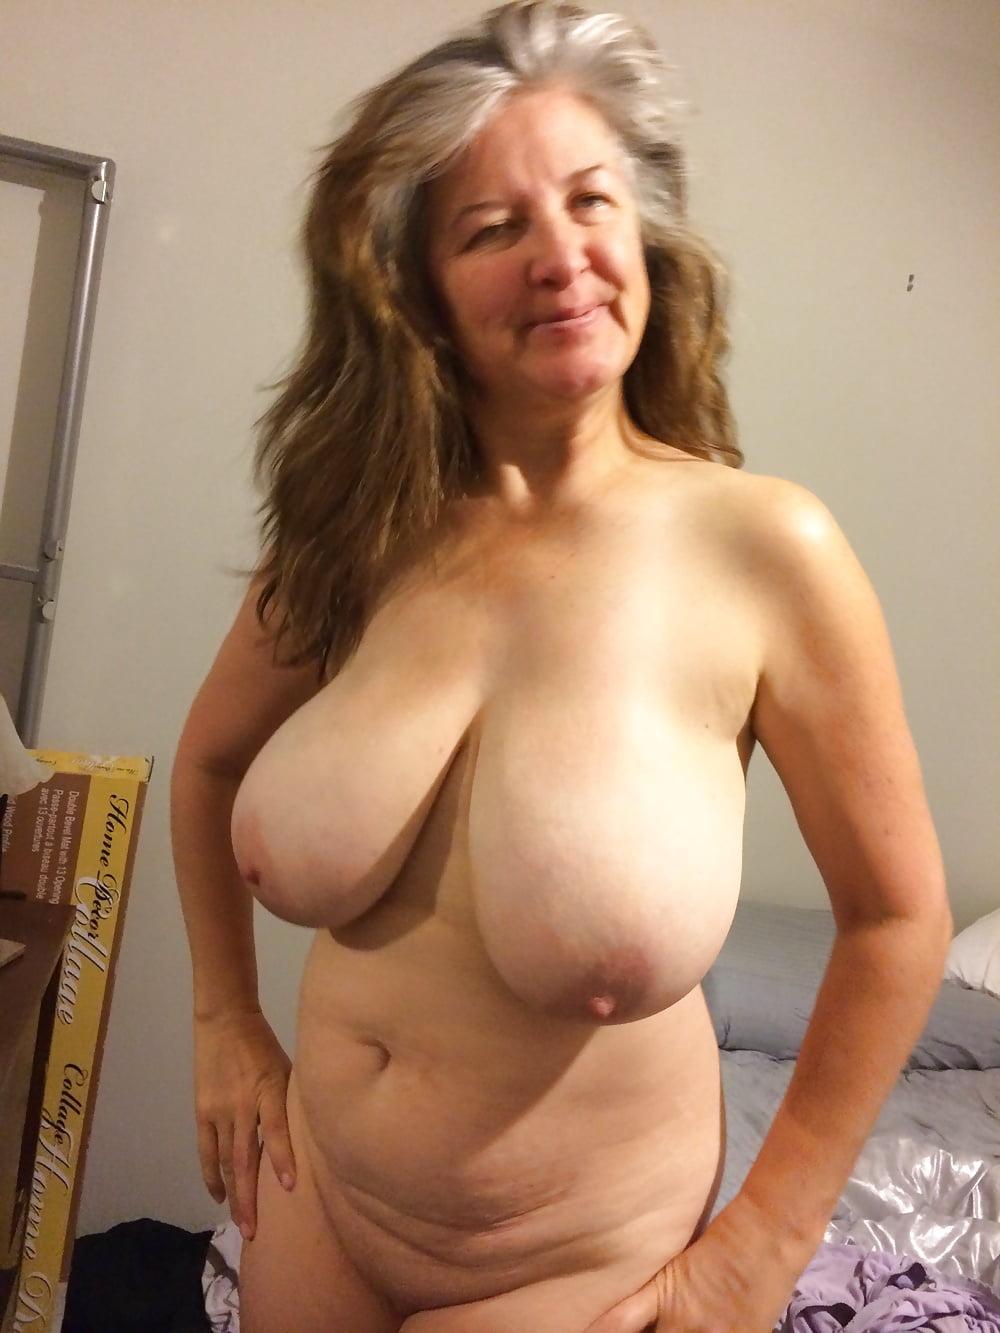 Old naked ladies tumblr-5377